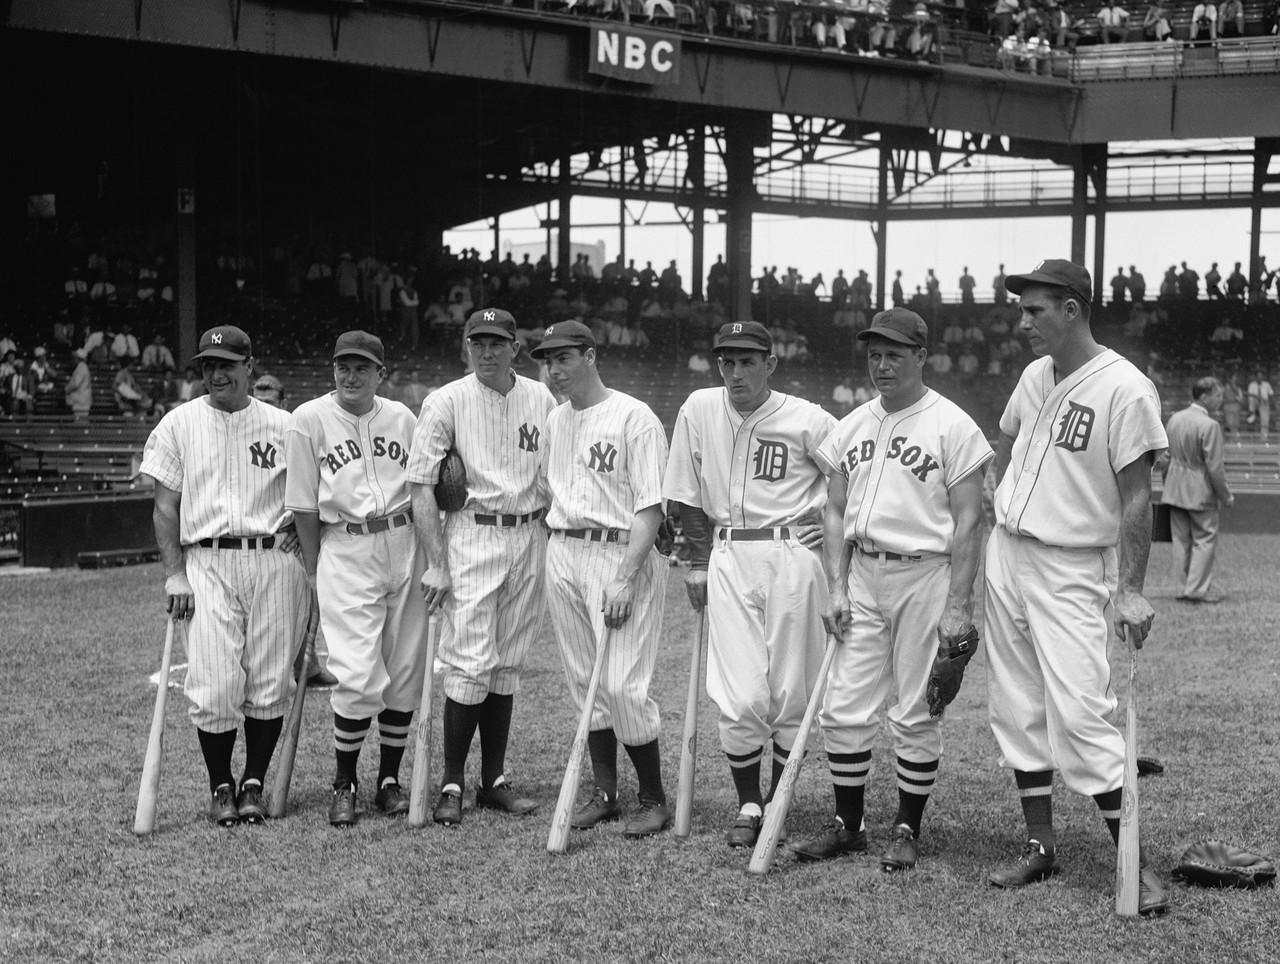 baseball-74003_1920